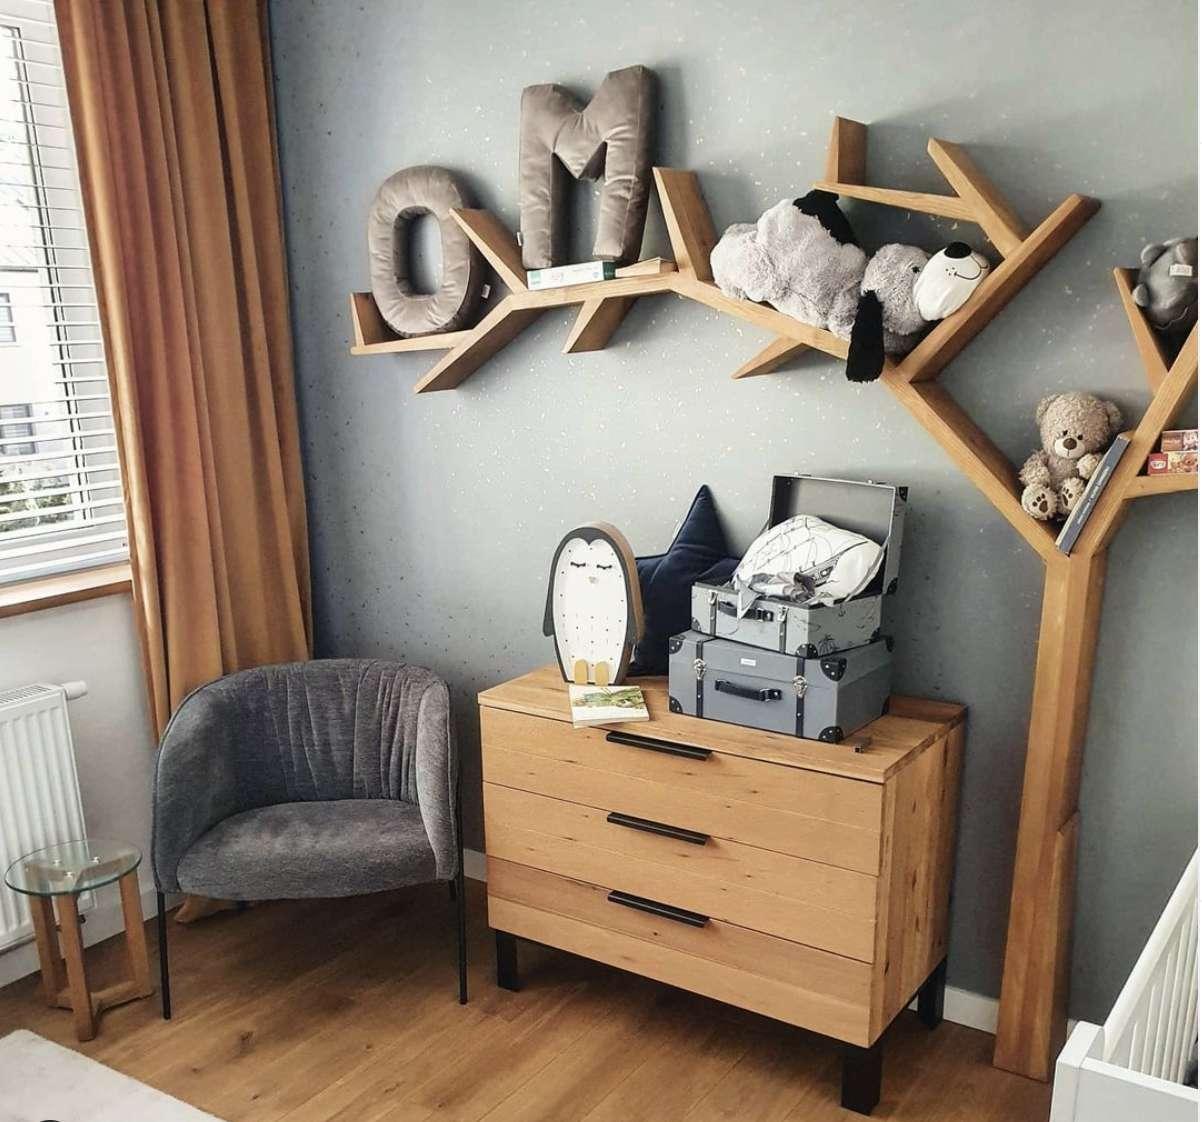 nursery with DIY tree branch shelf